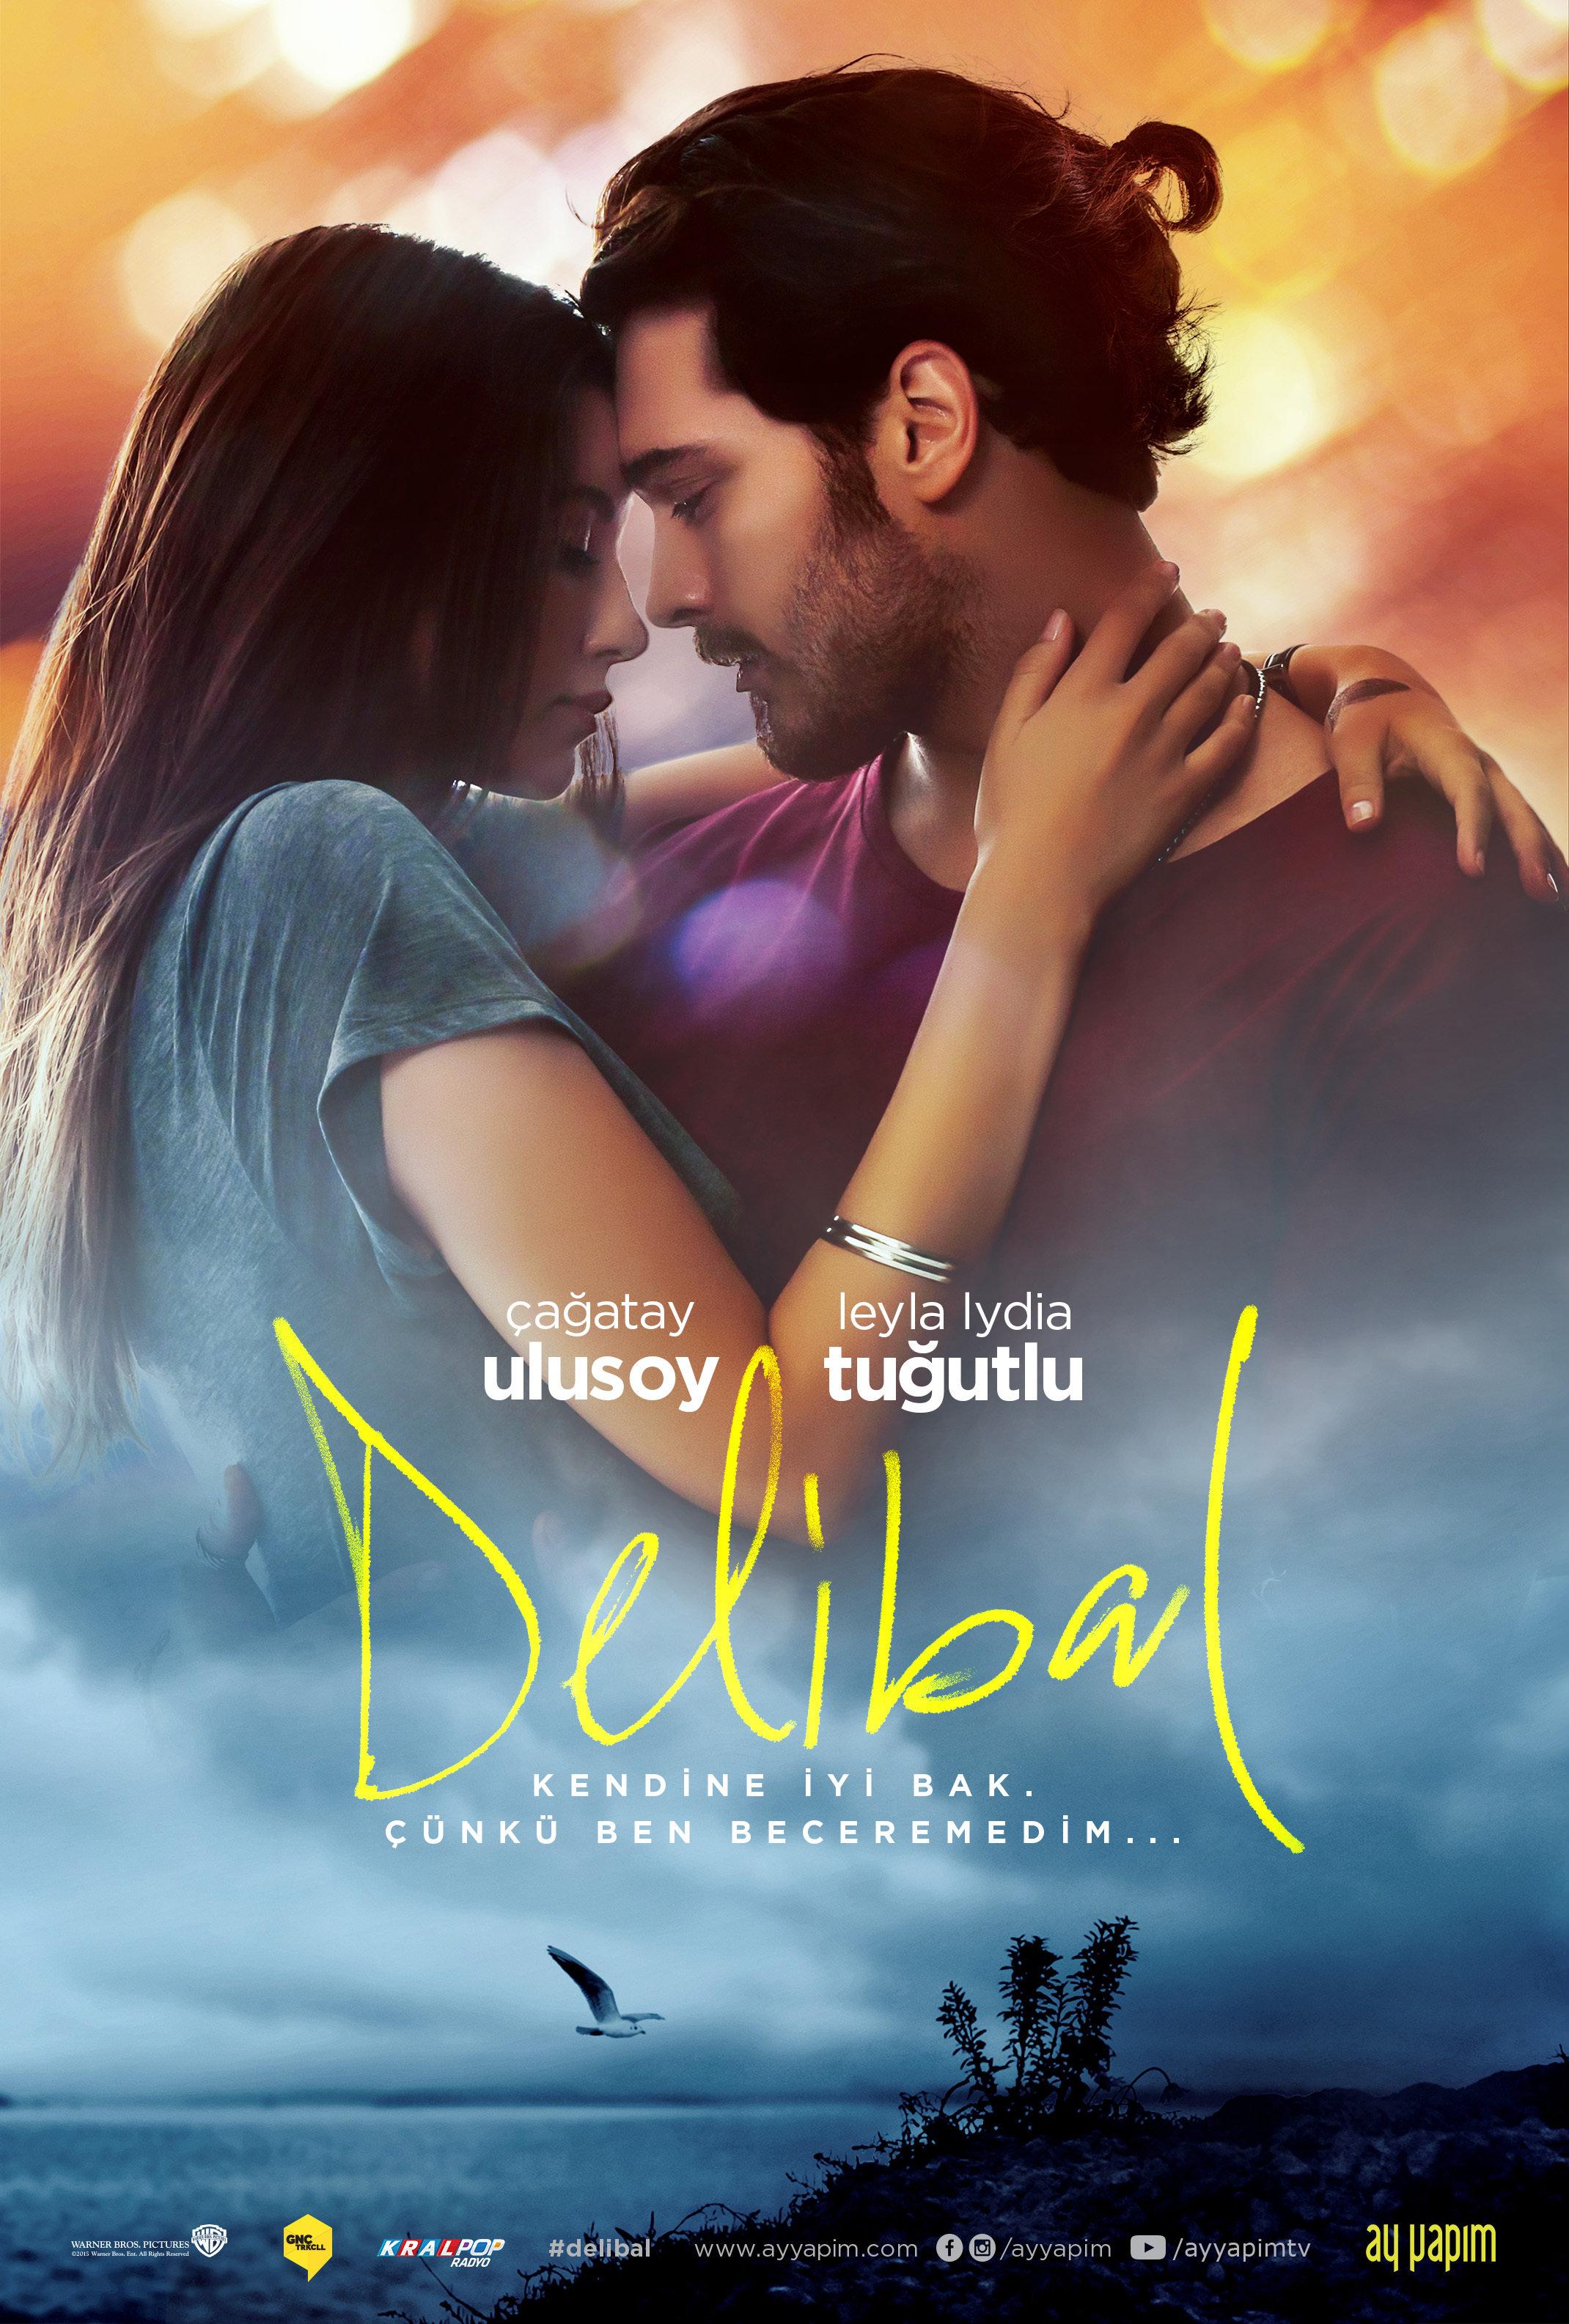 phim tình cảm delibal